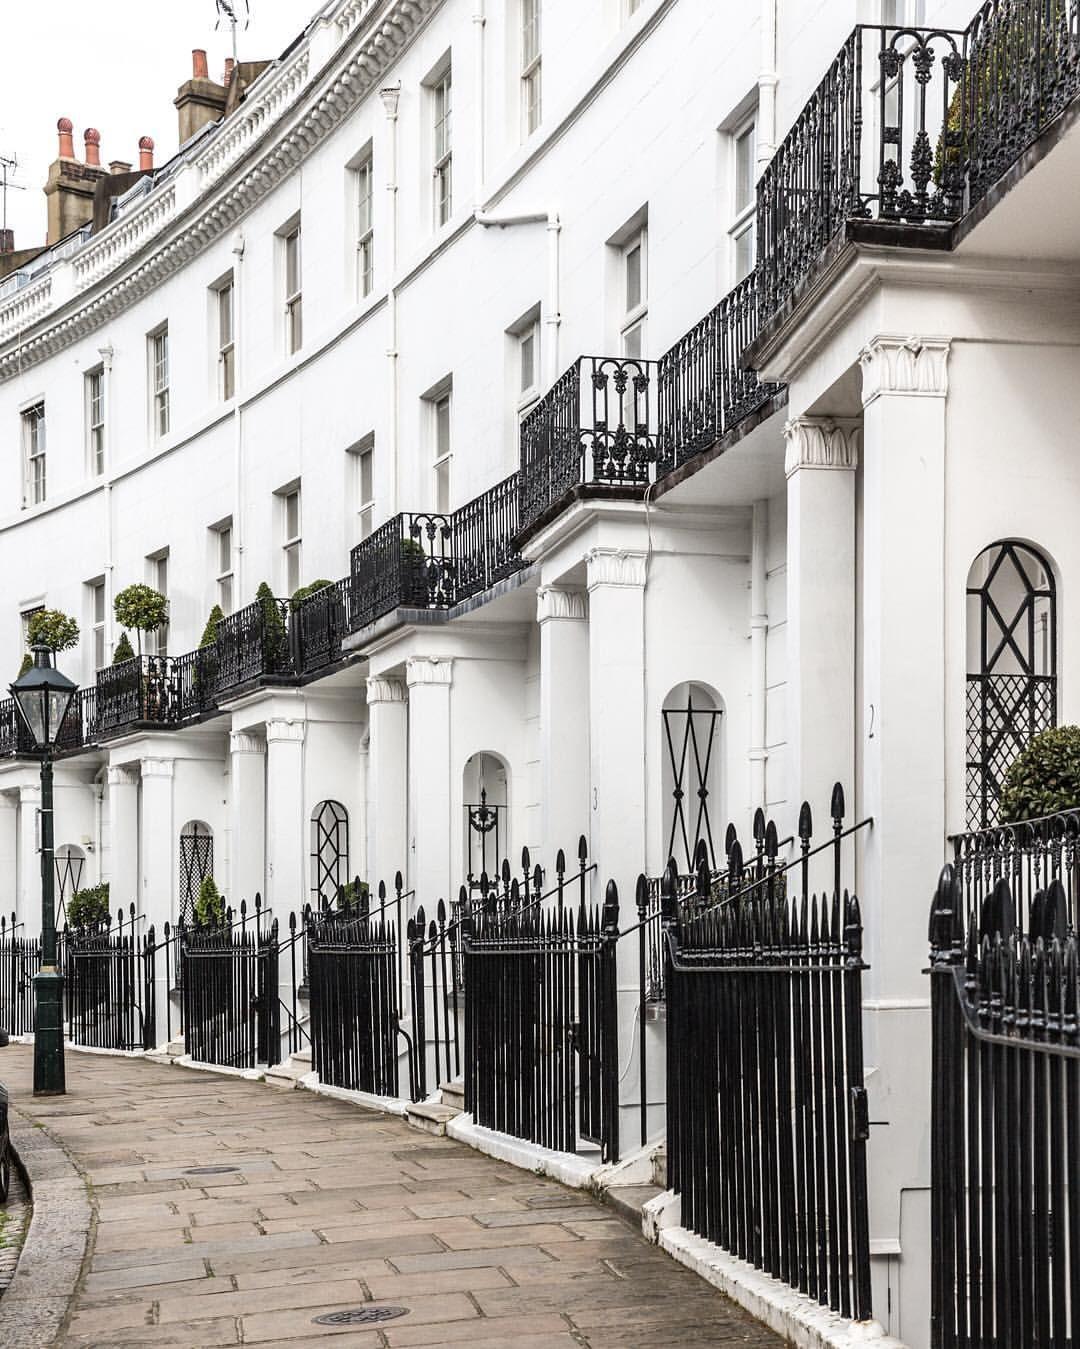 Houses In South Kensington, London